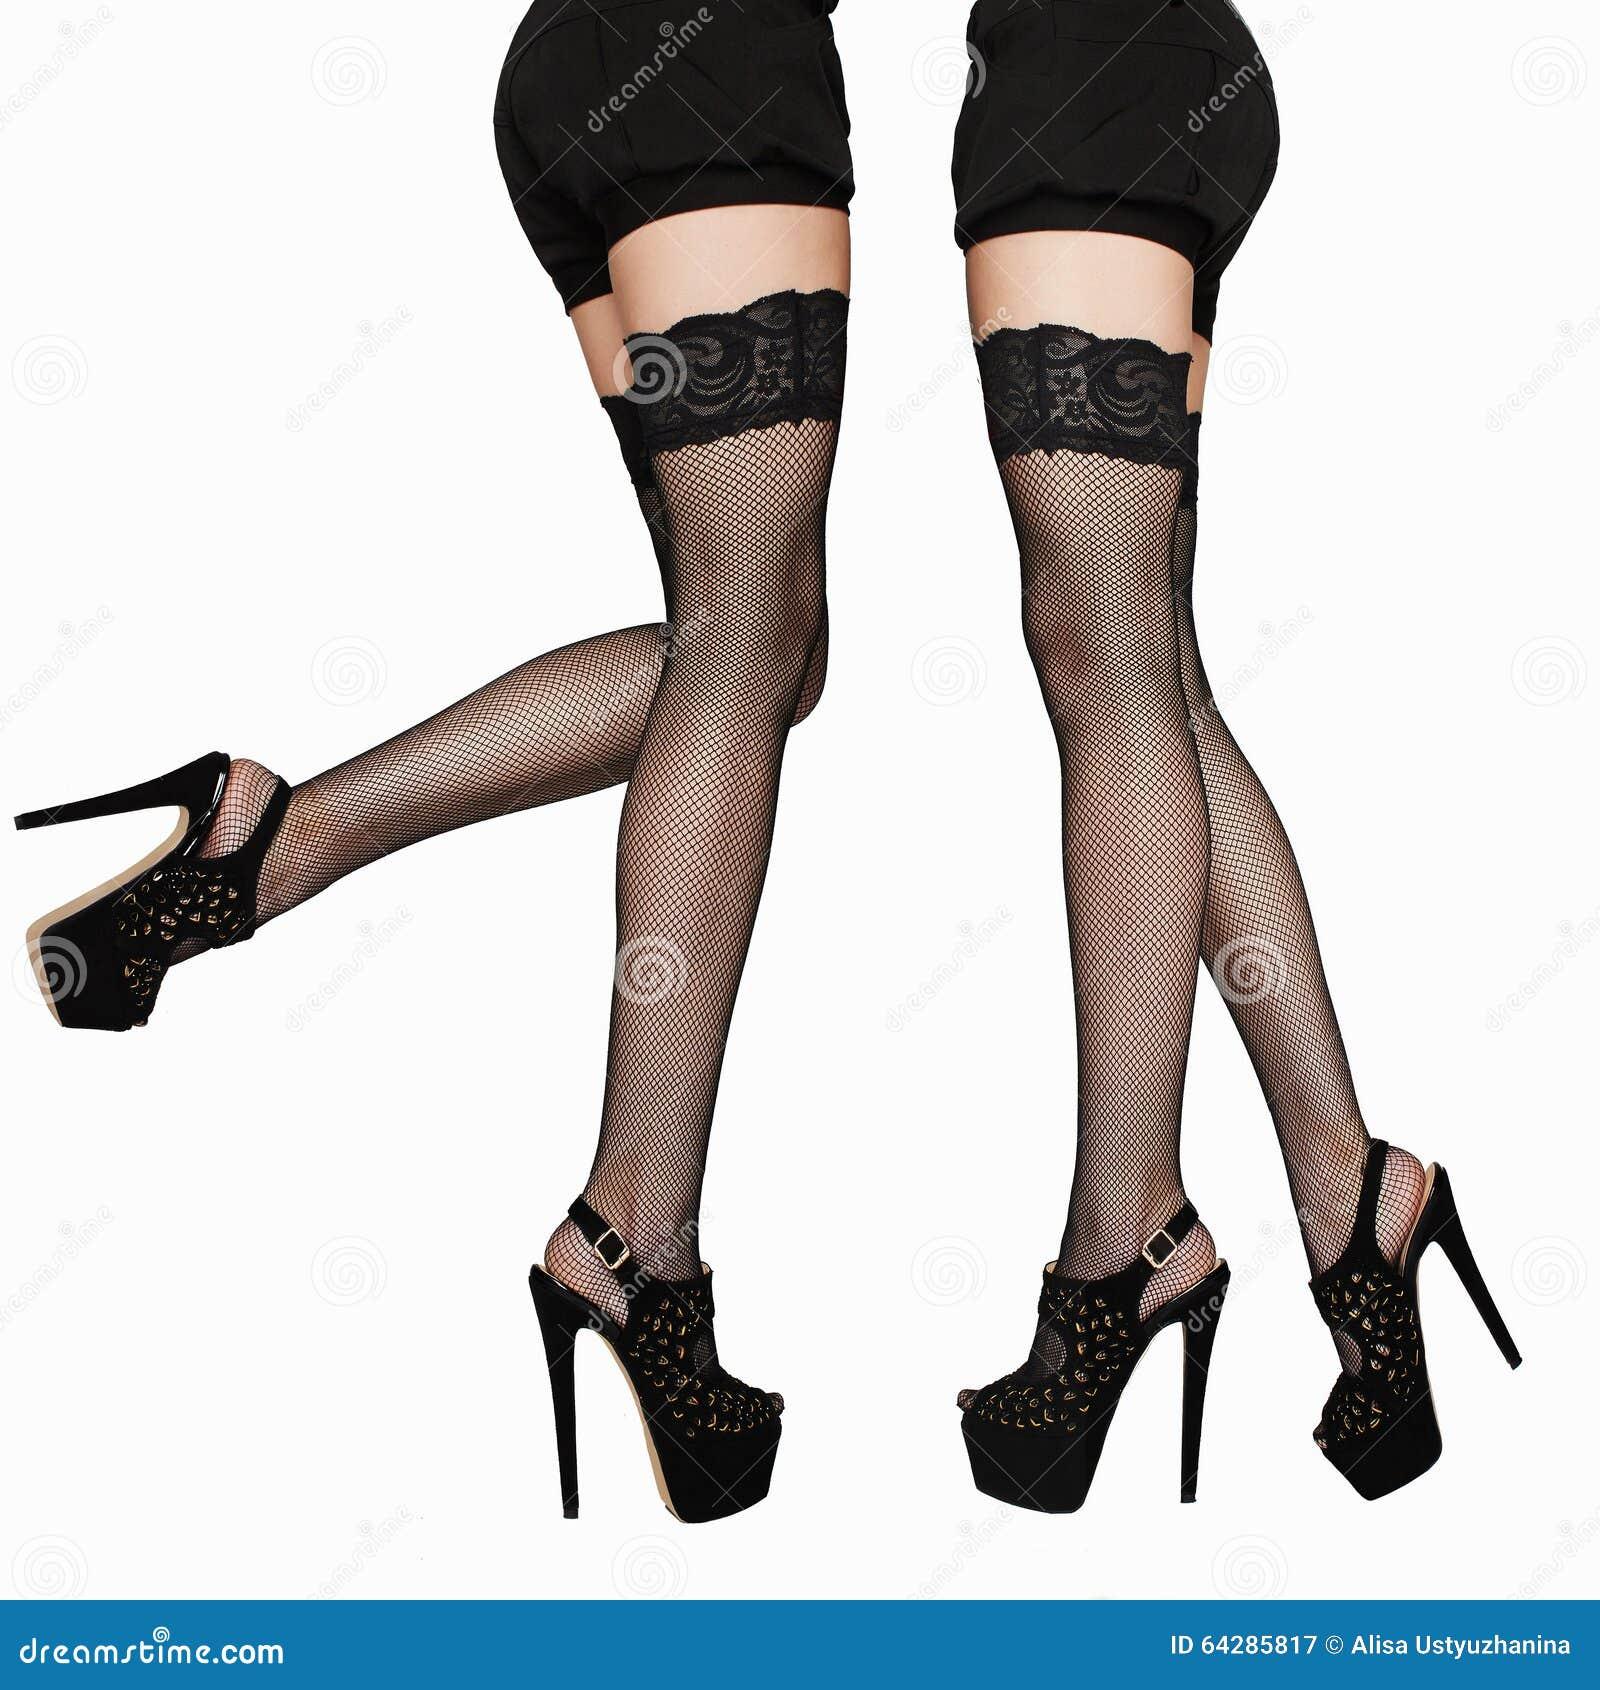 hee milf women Heels - 110849 videos heels, boots, feet, high heels, heeljob, dress and much more.